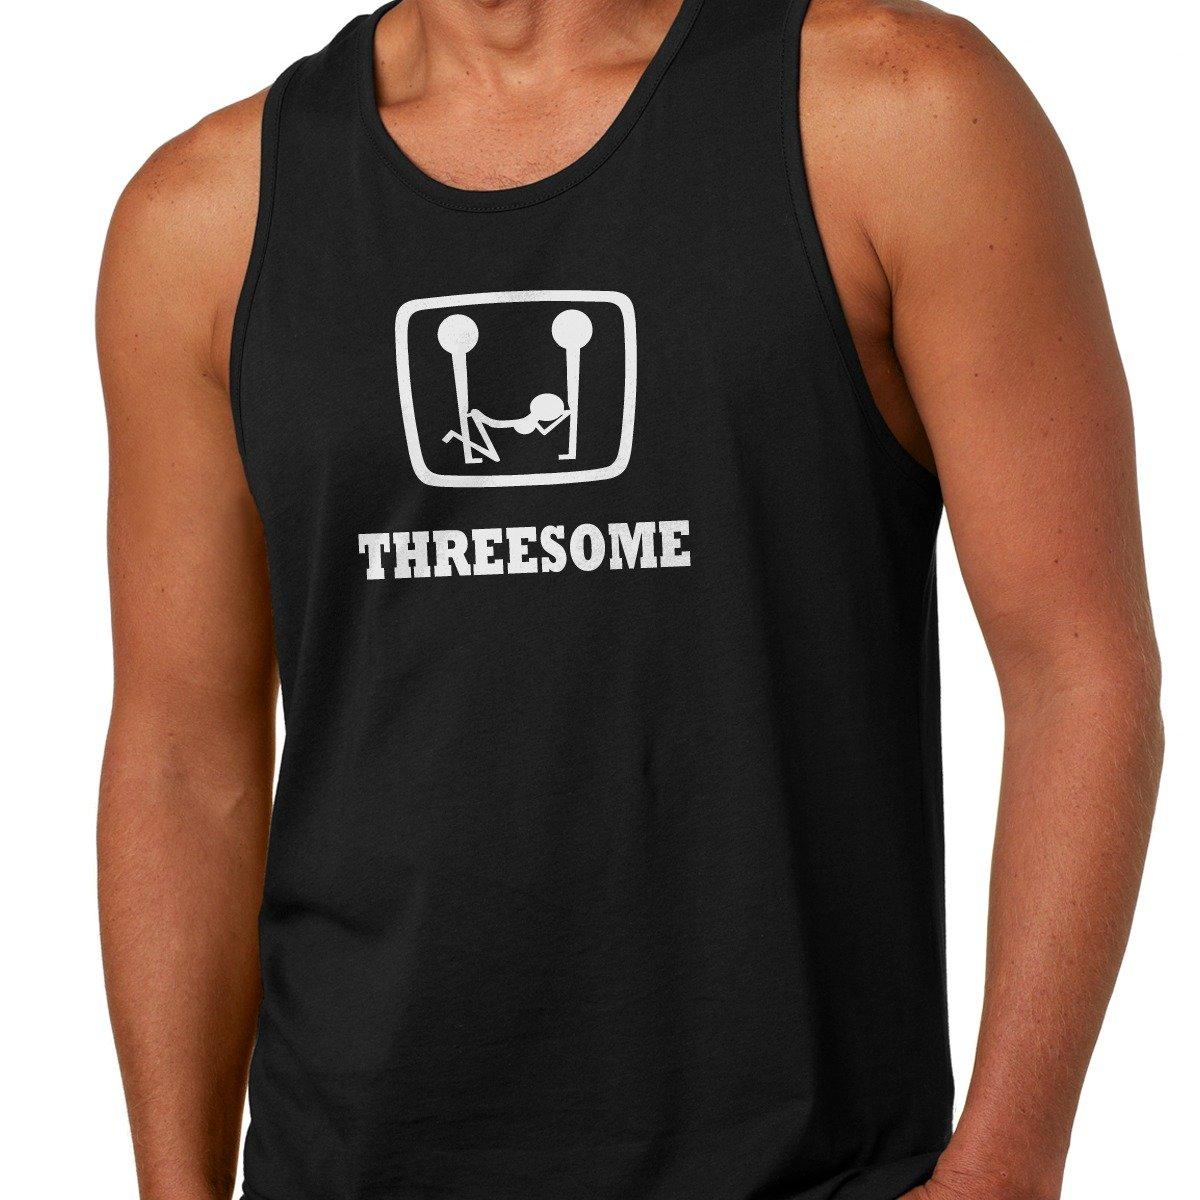 Threesome Anyone?